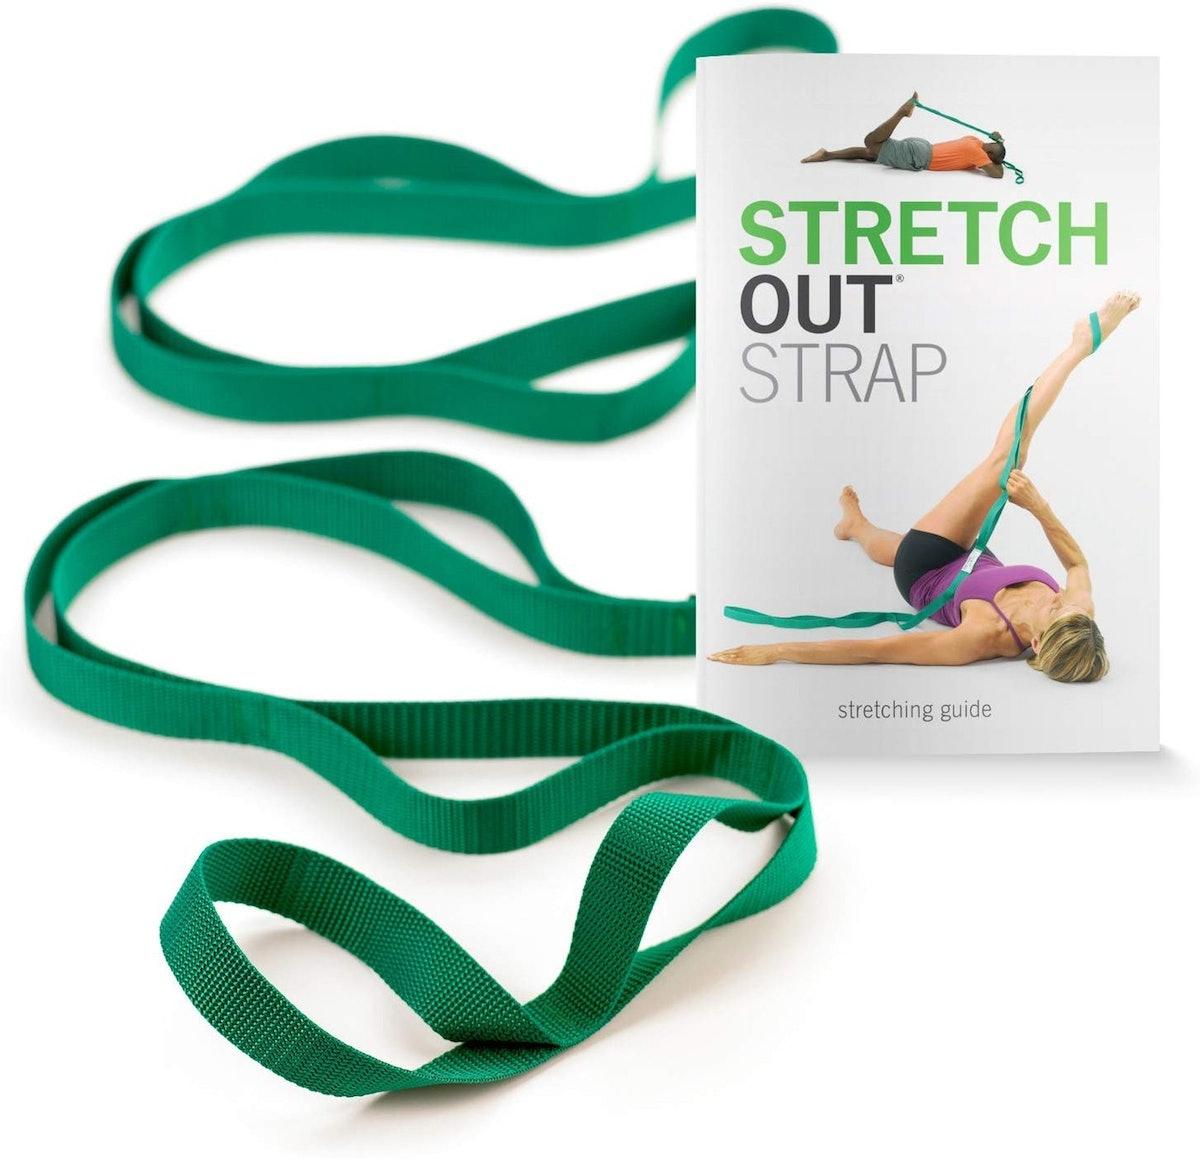 The Original Stretch-Out Strap